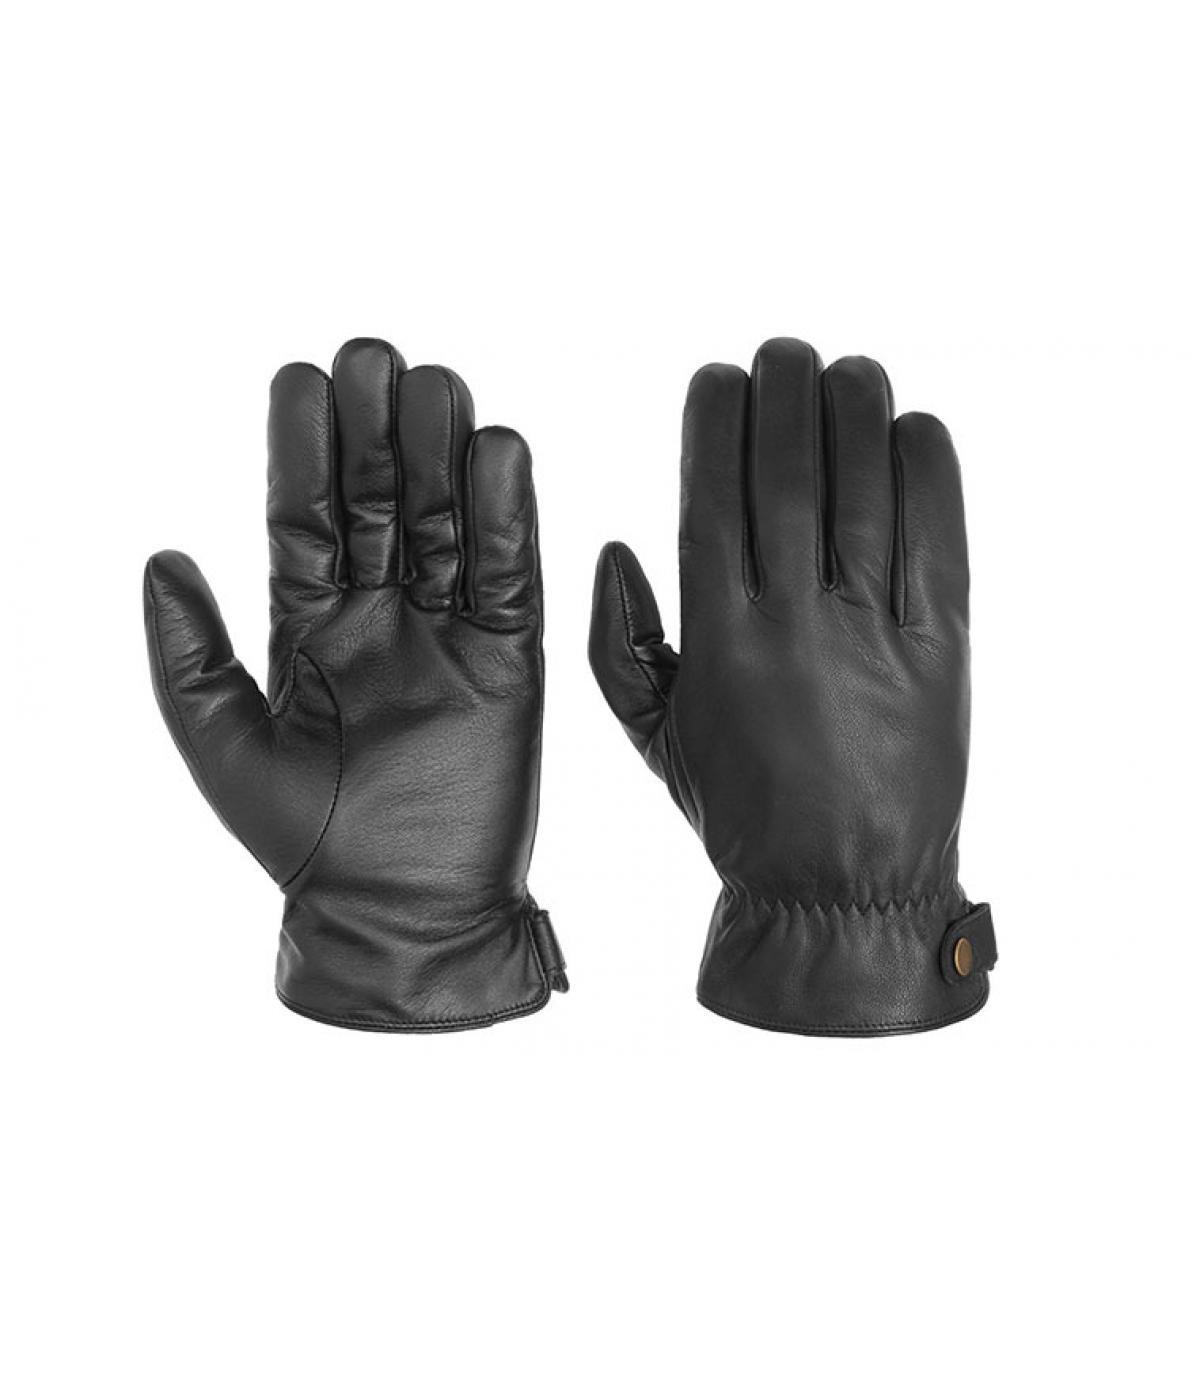 guantes de cuero negro tocan Stetson